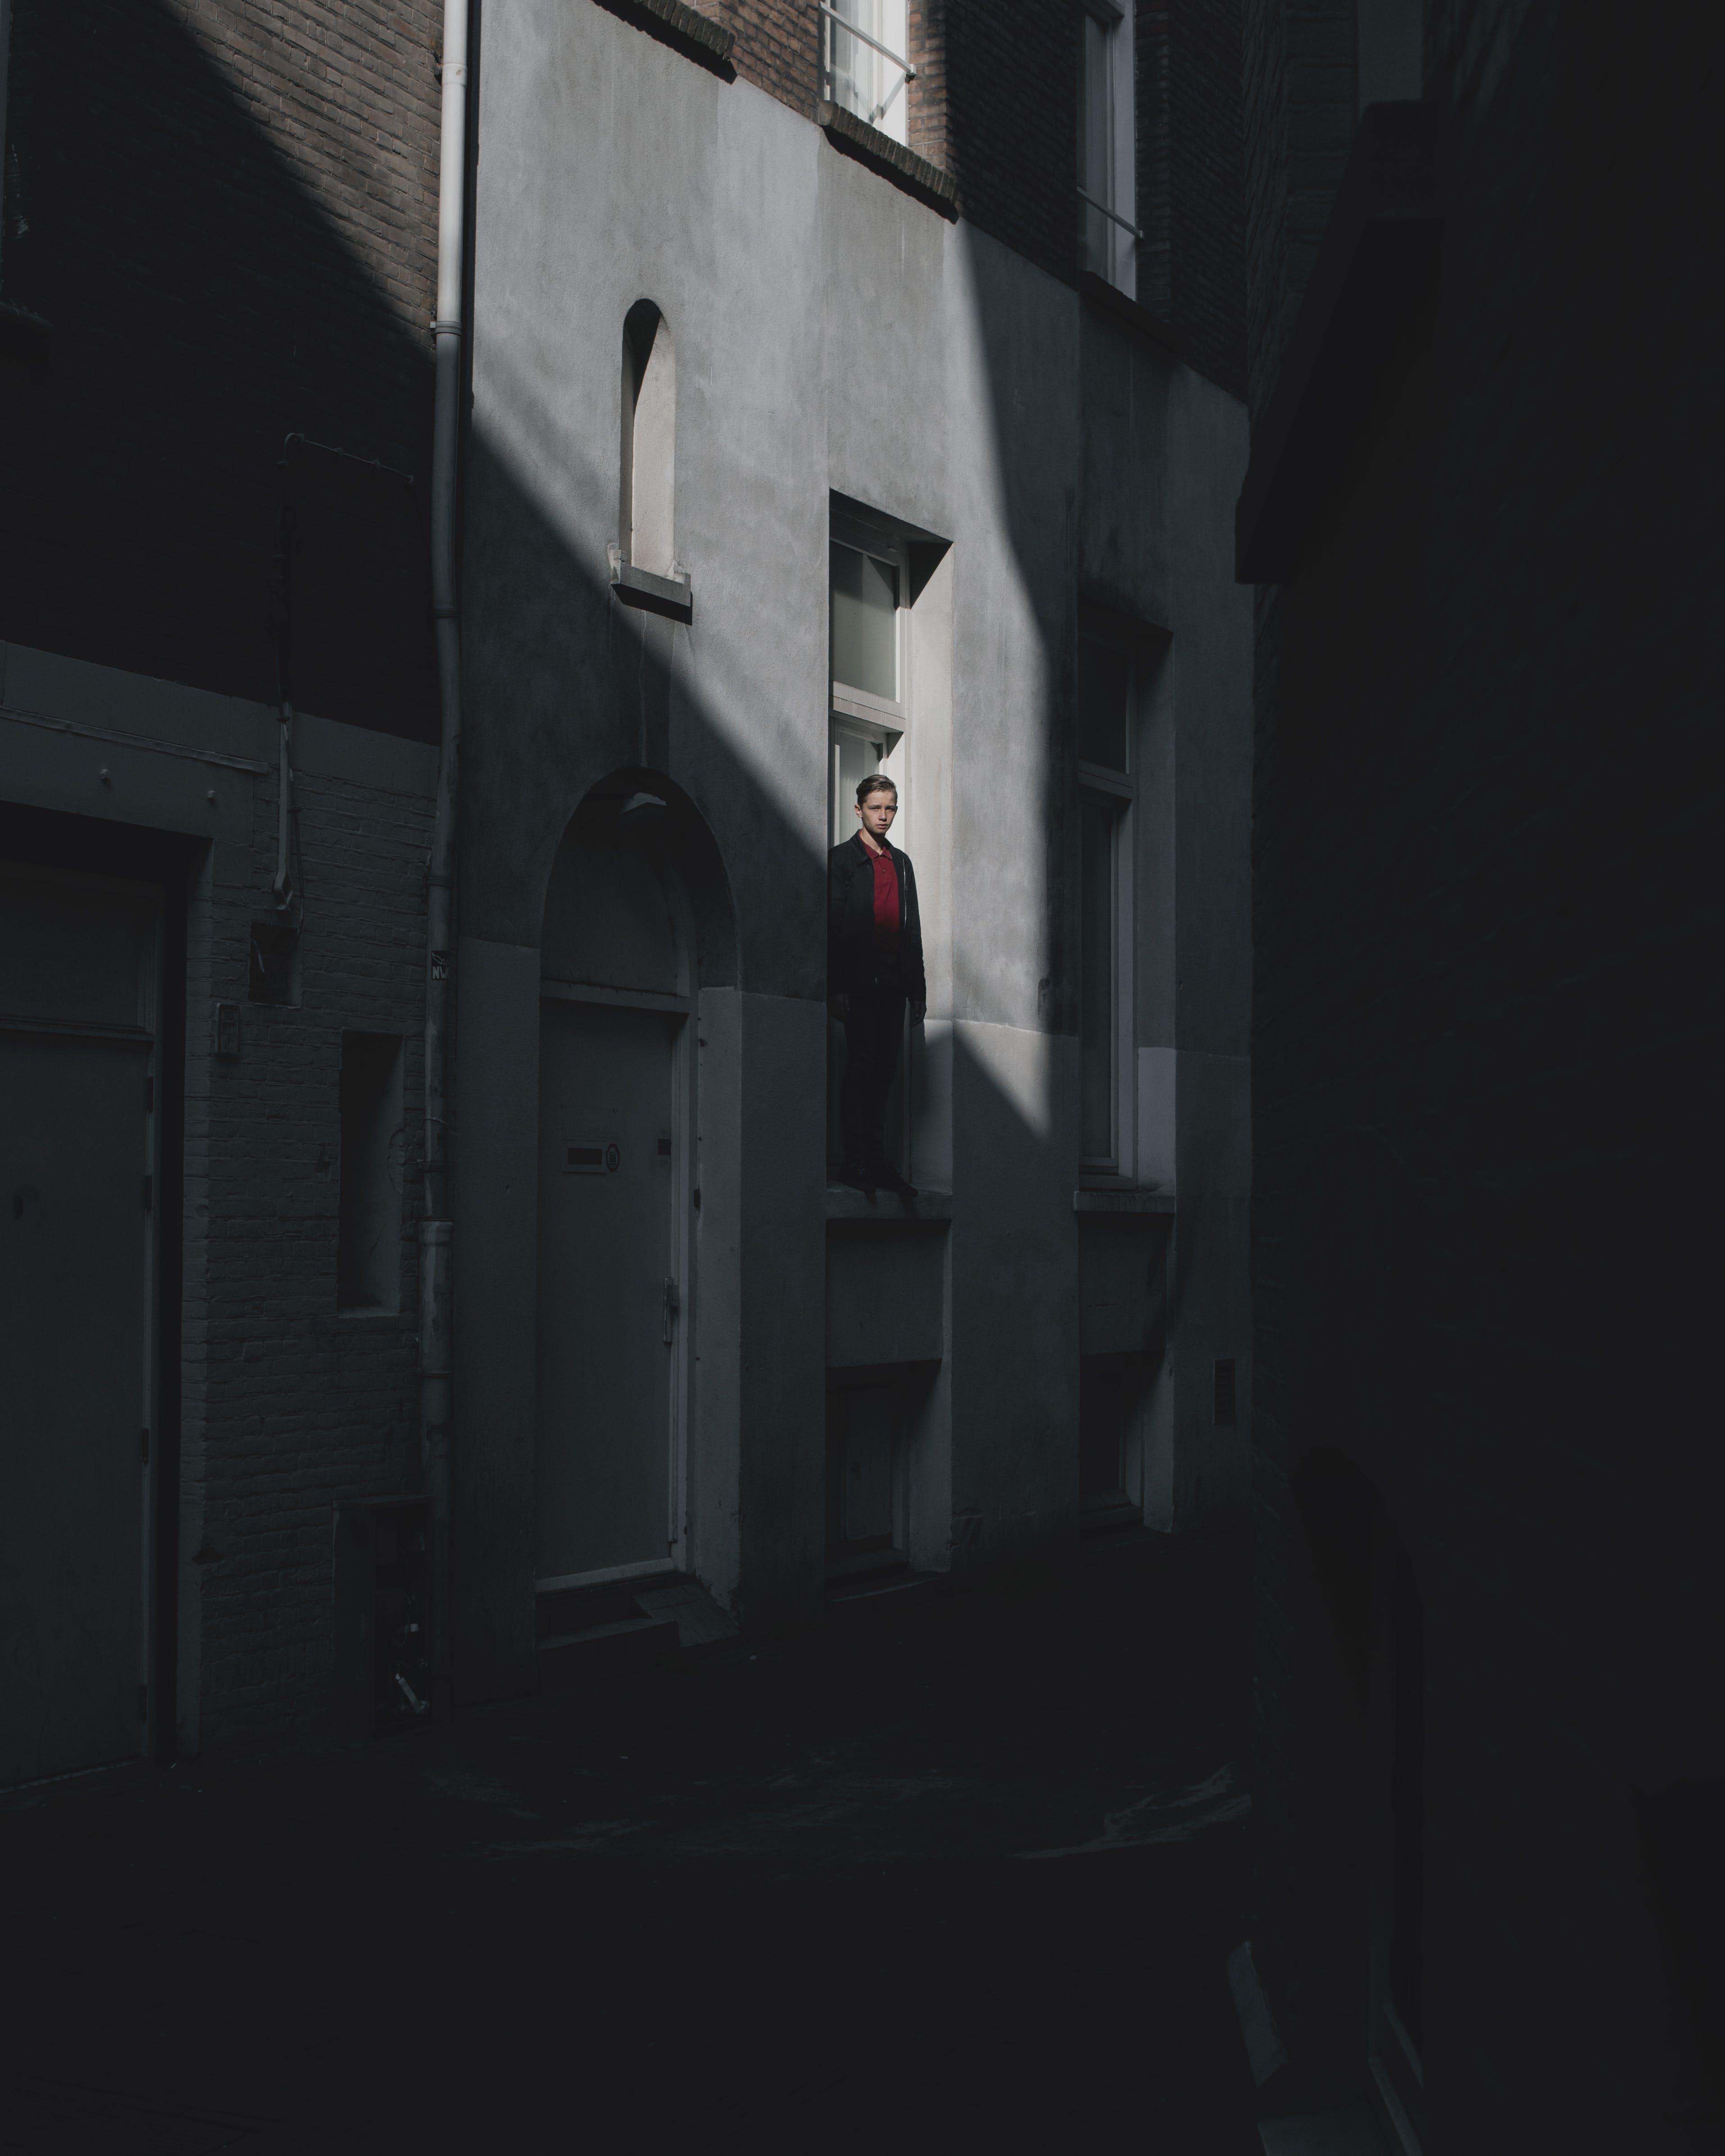 Man Standing on Window